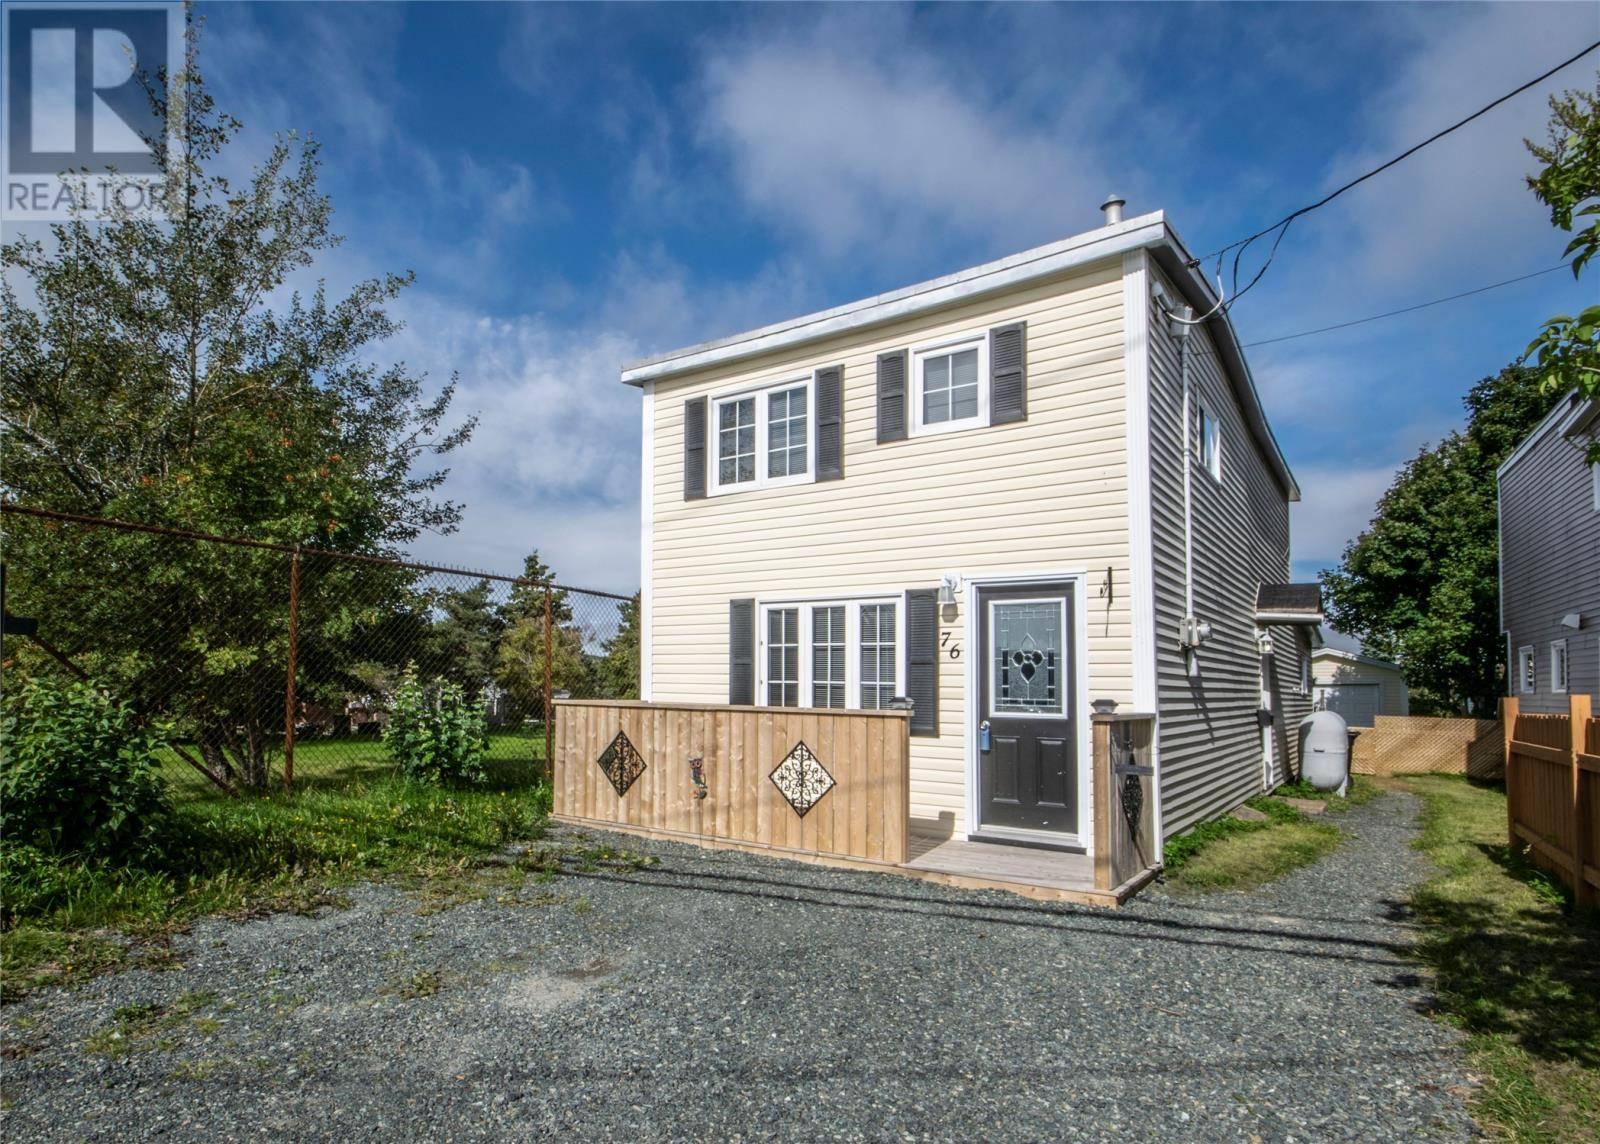 House for sale at 76 Blackmarsh Rd St. John's Newfoundland - MLS: 1203092